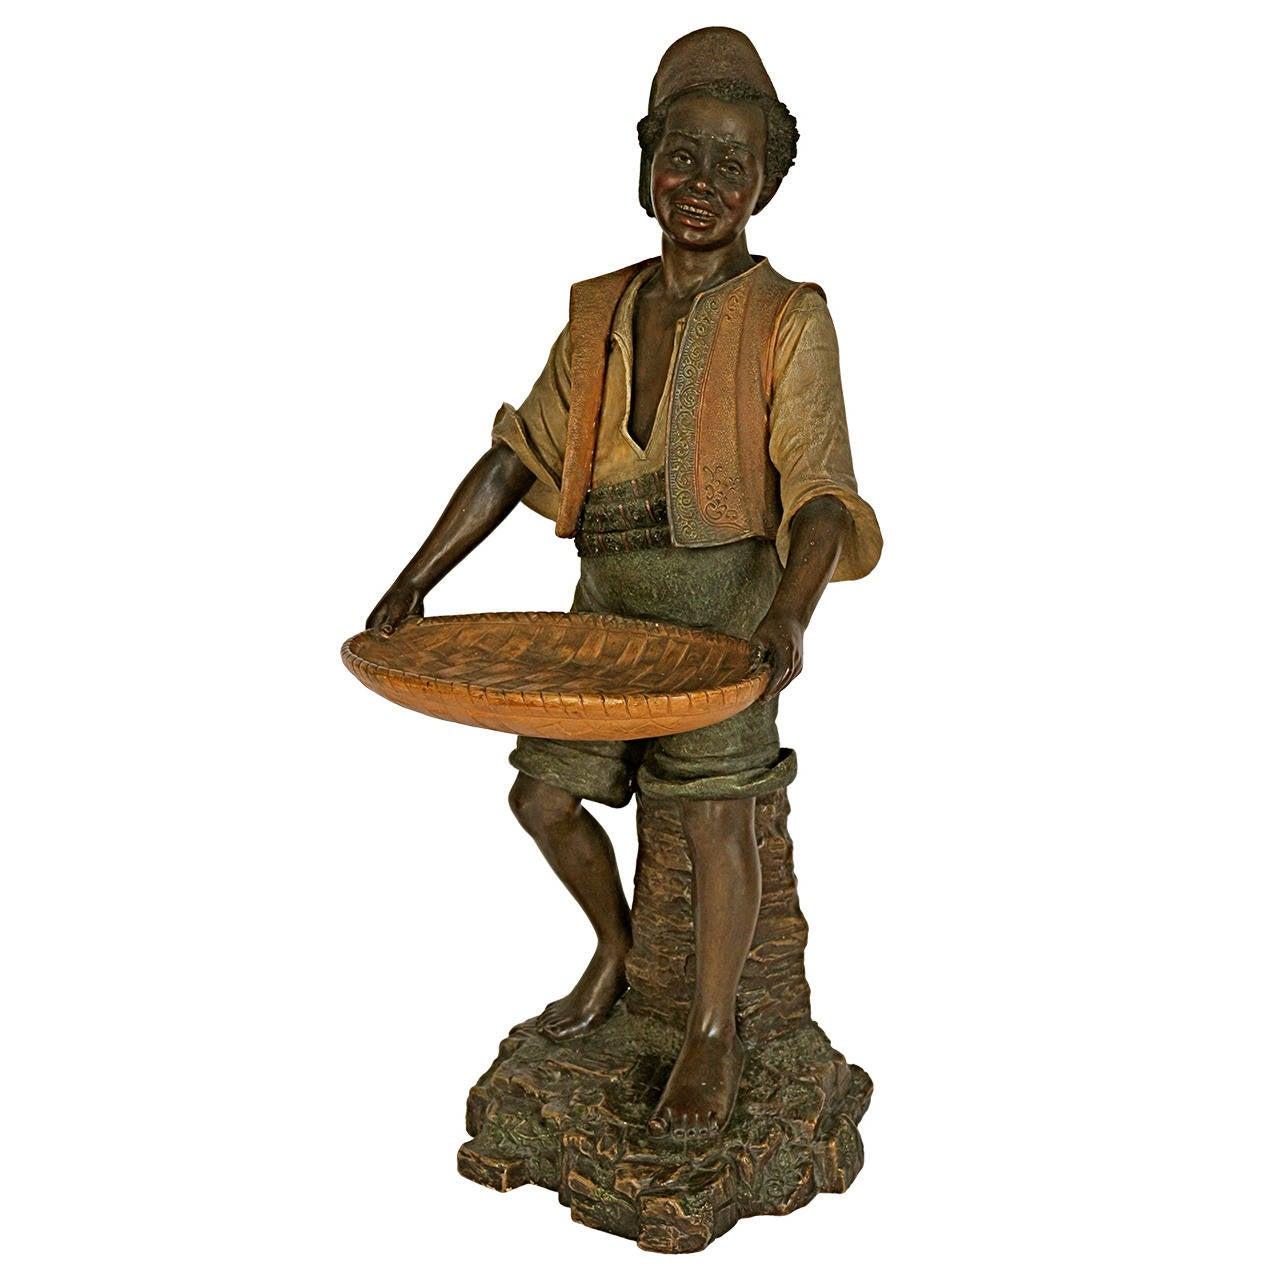 Terracotta Figure by Bernhardt Bloch